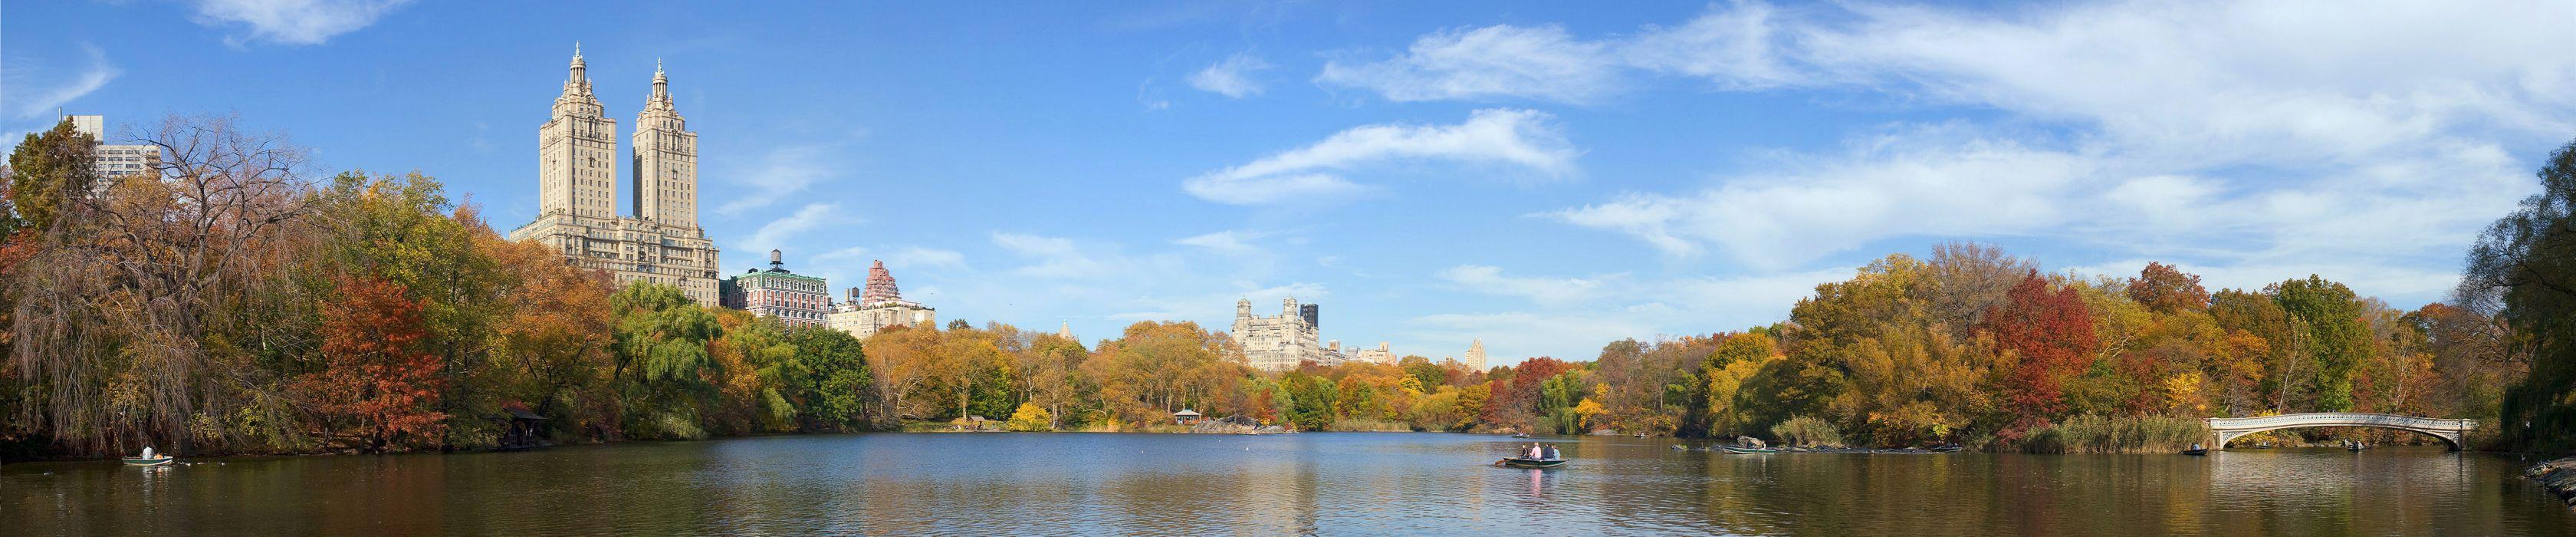 New york city central park autumn lake h wallpaper for Central park wallpaper